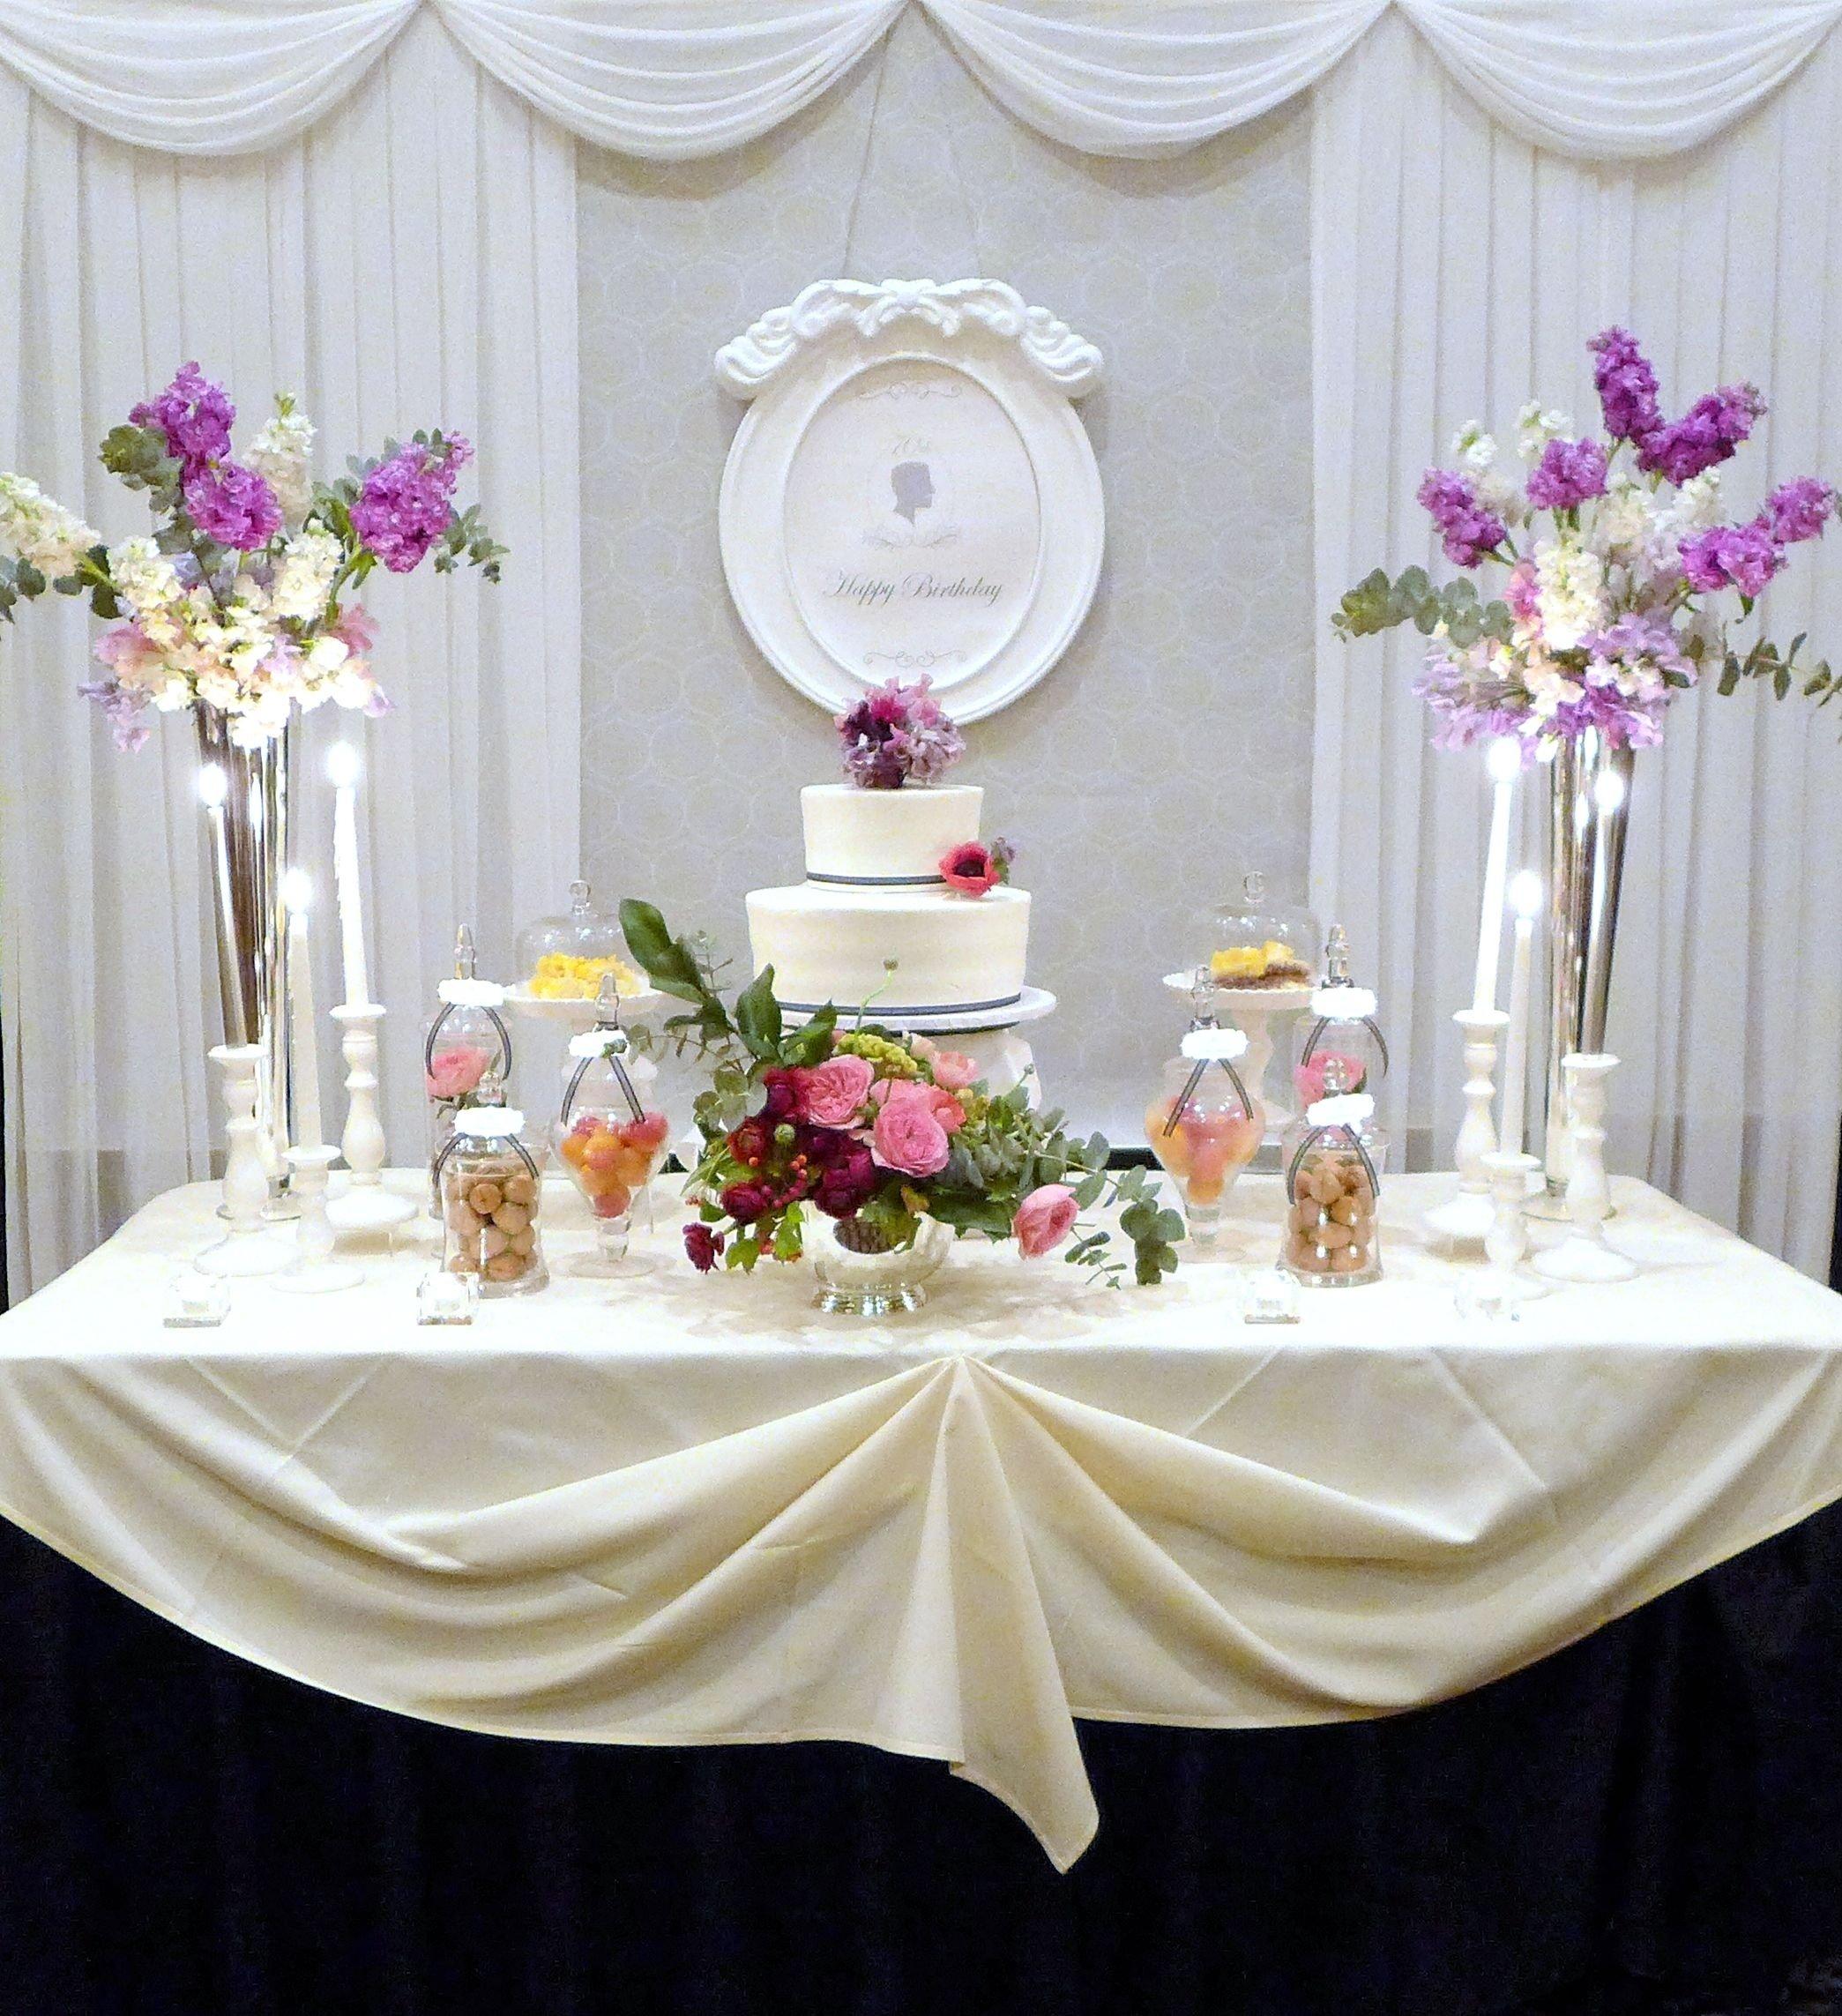 10 Elegant 70Th Birthday Party Ideas For Mom